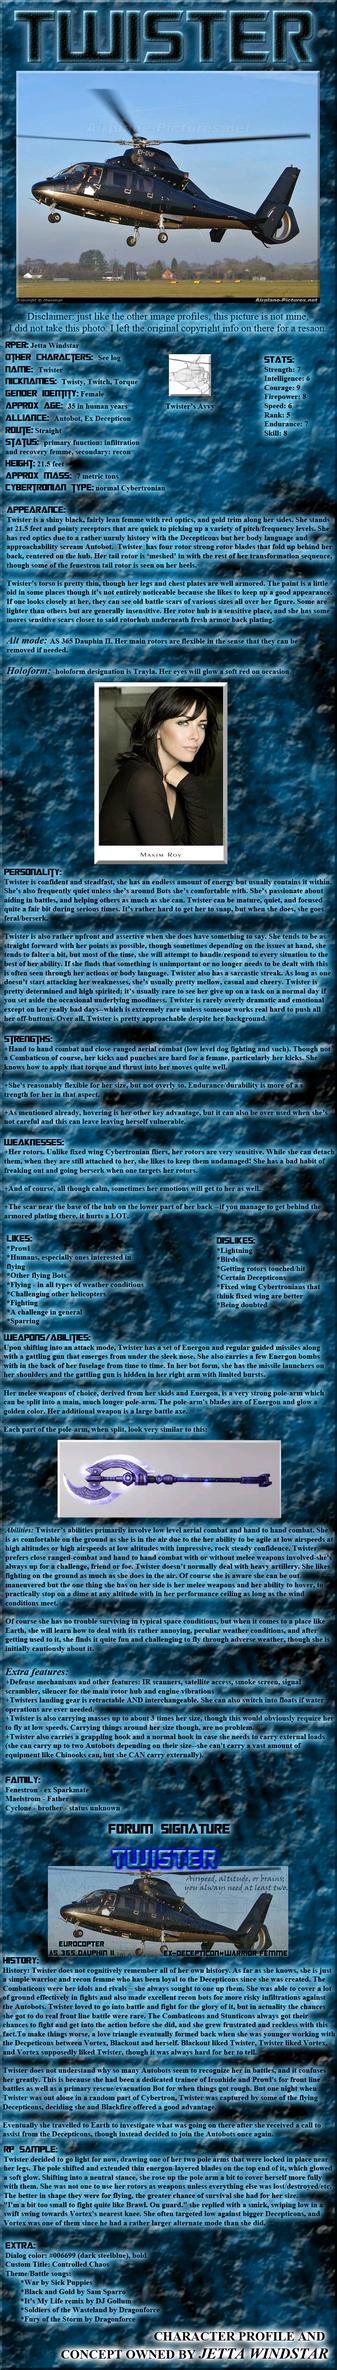 Twister: TFP Falling Skies Image Profile by Jetta-Windstar